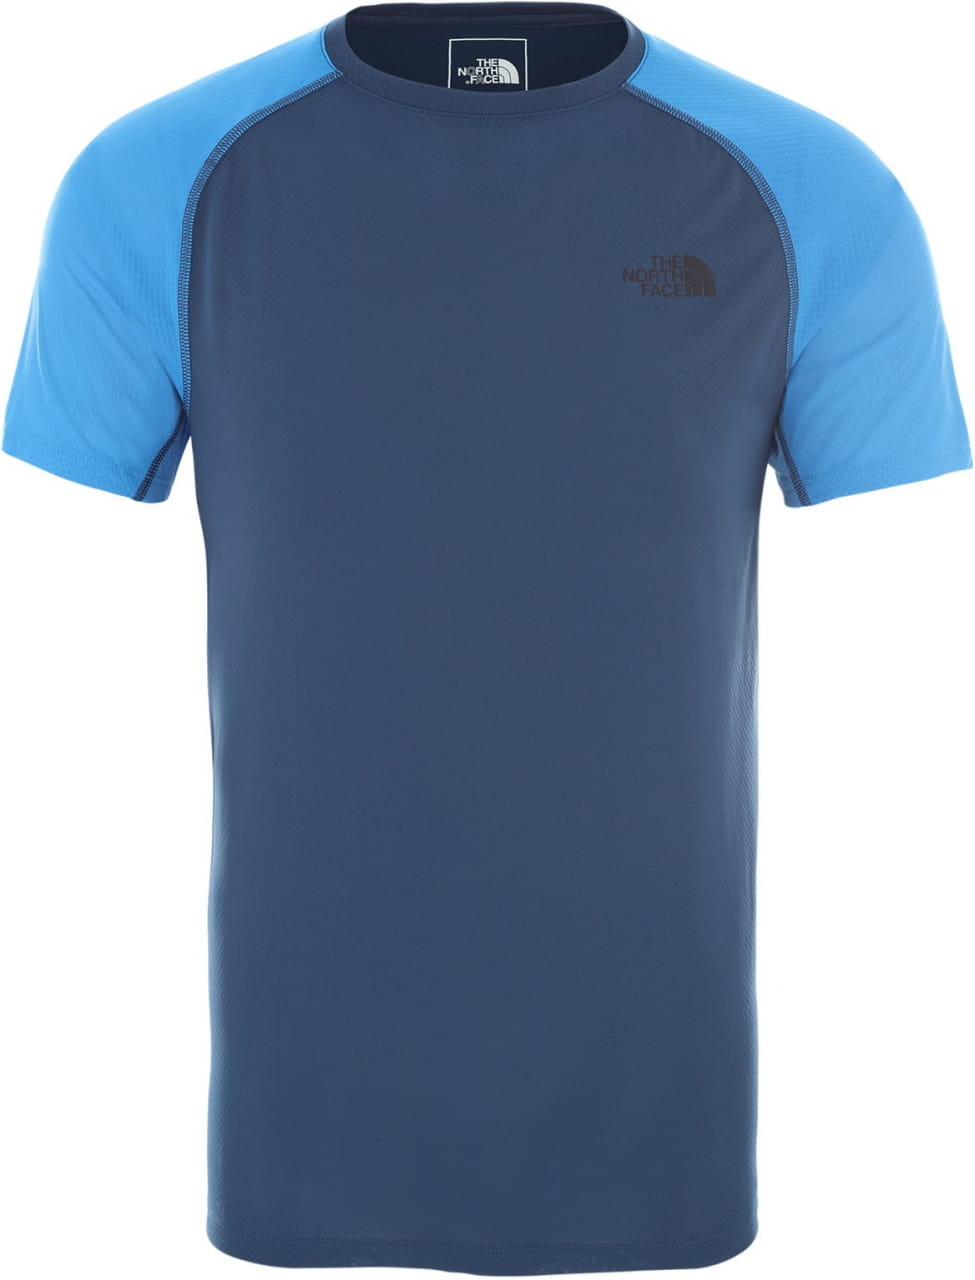 Pánské tričko The North Face Men's Ambition T-Shirt